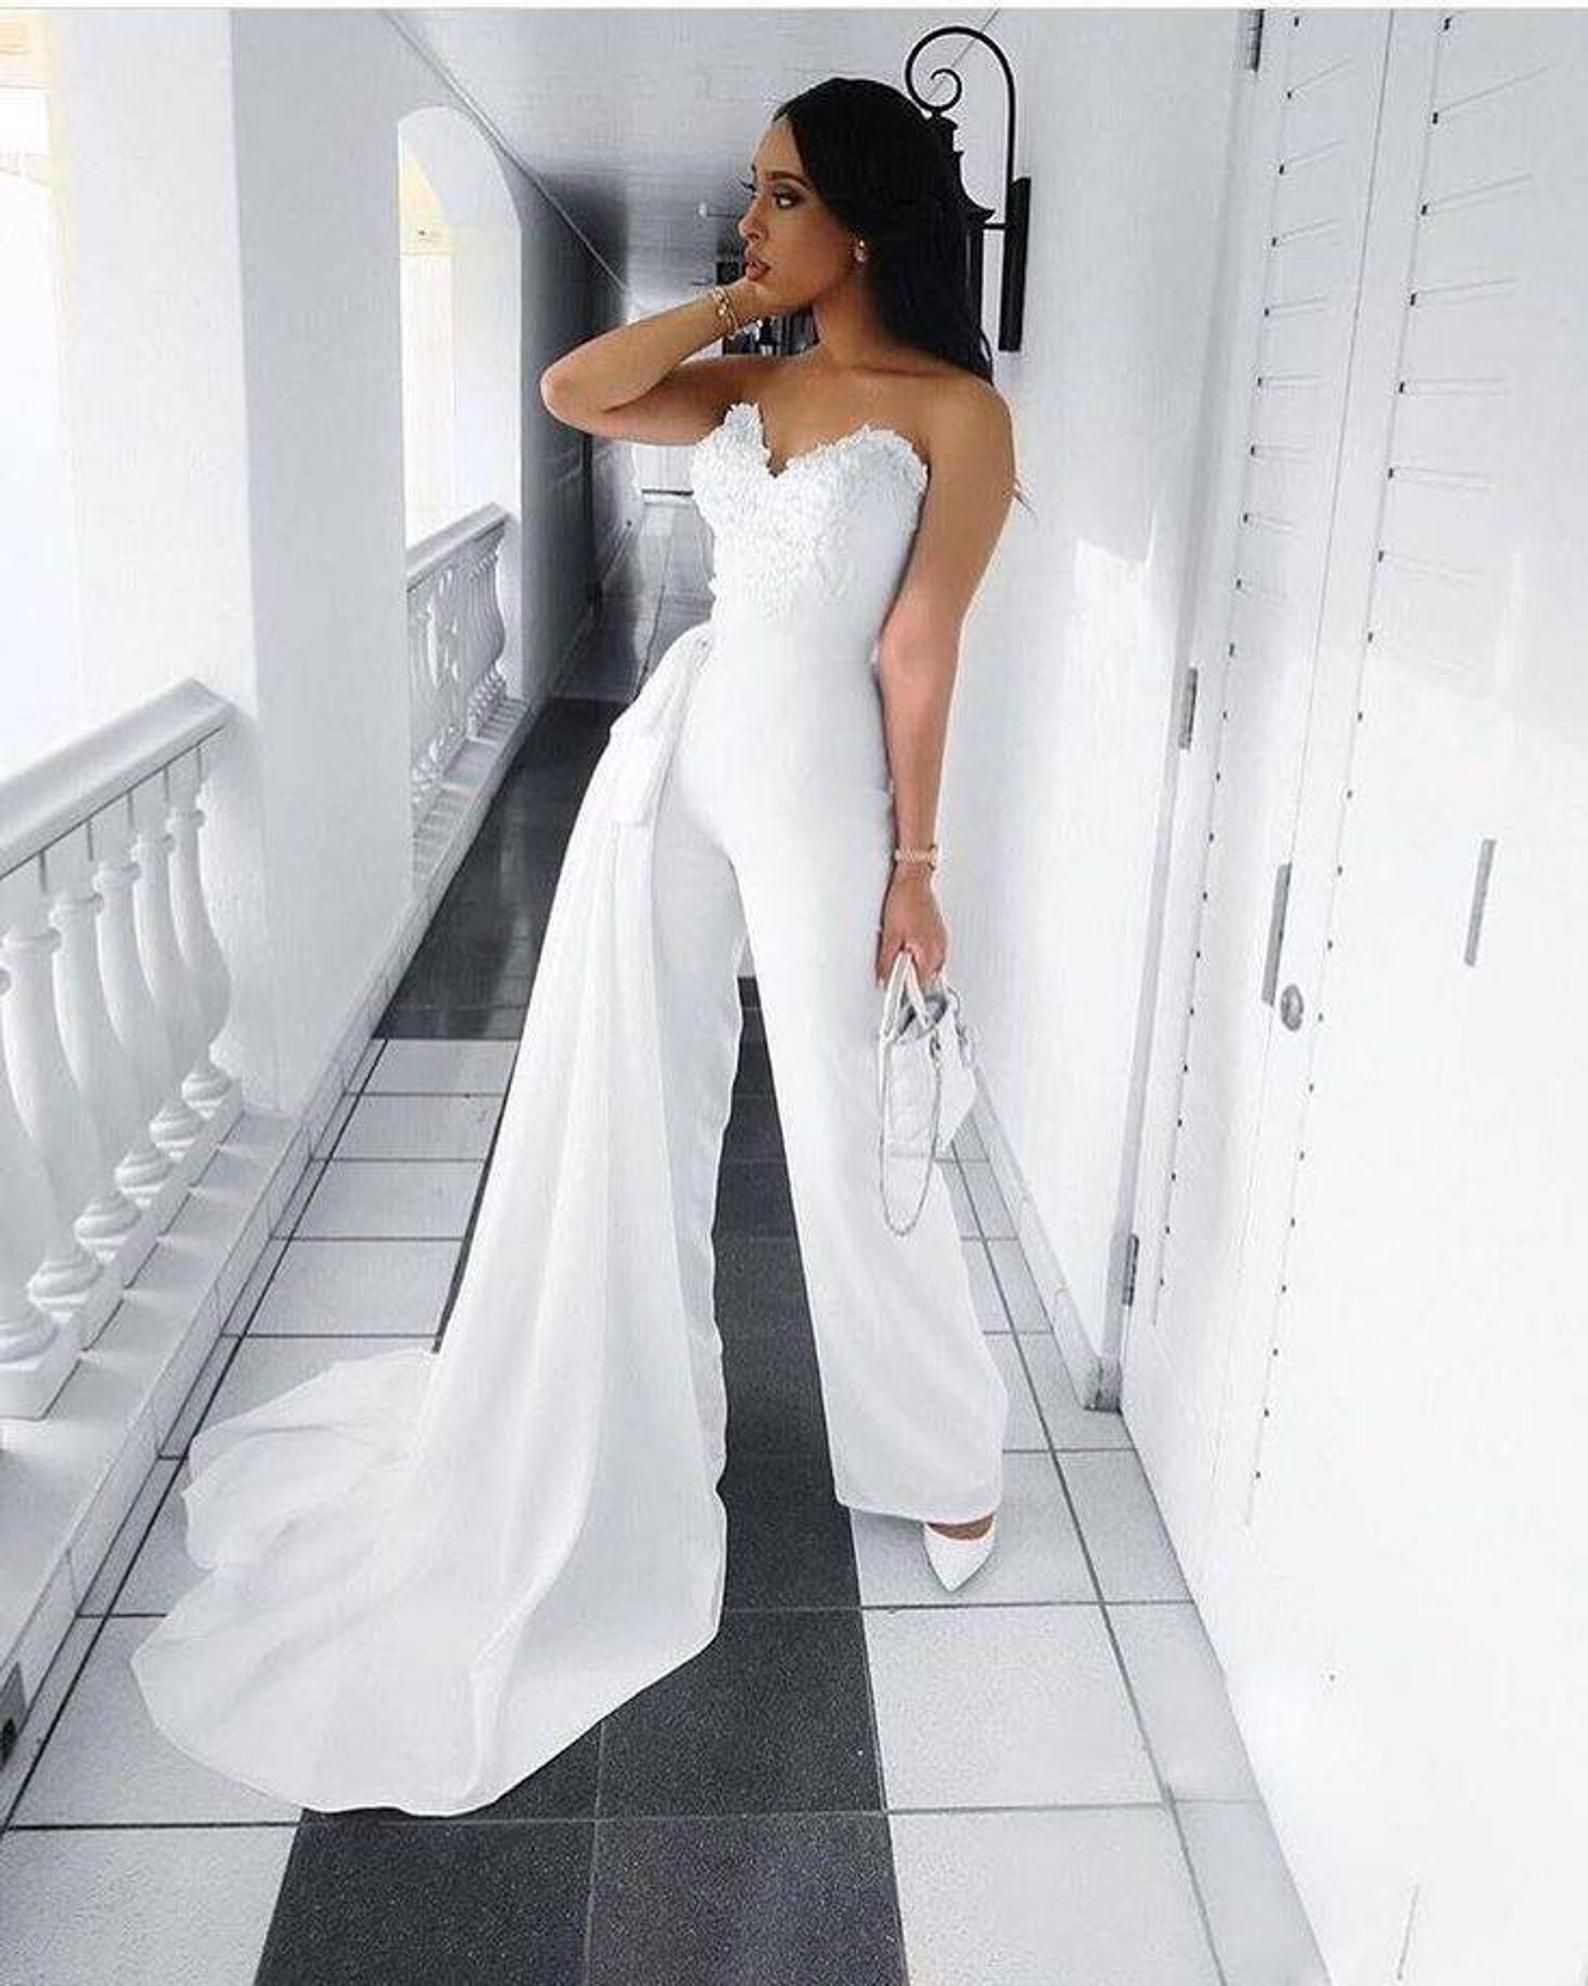 White Women S Wedding Reception Jumpsuitwomens Party Etsy Wedding Reception Outfit Bridal Jumpsuit Jumpsuit Elegant [ 1986 x 1588 Pixel ]